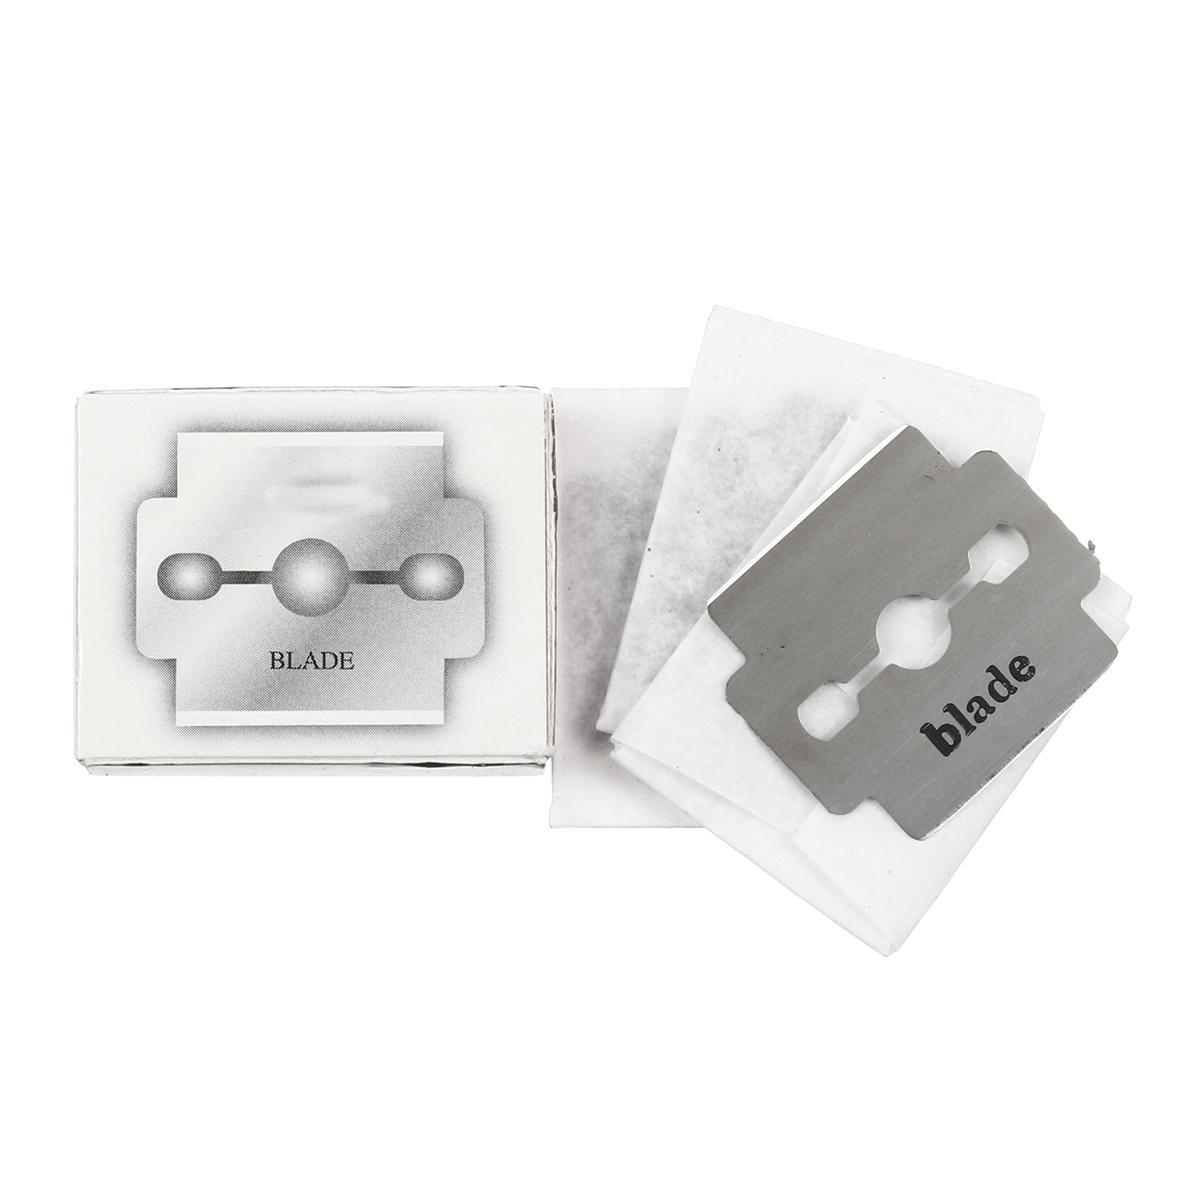 20PCS Pedicure Kit Rasp Foot File Callus Remover Scraper Nail Care Tool W/ Storage Box